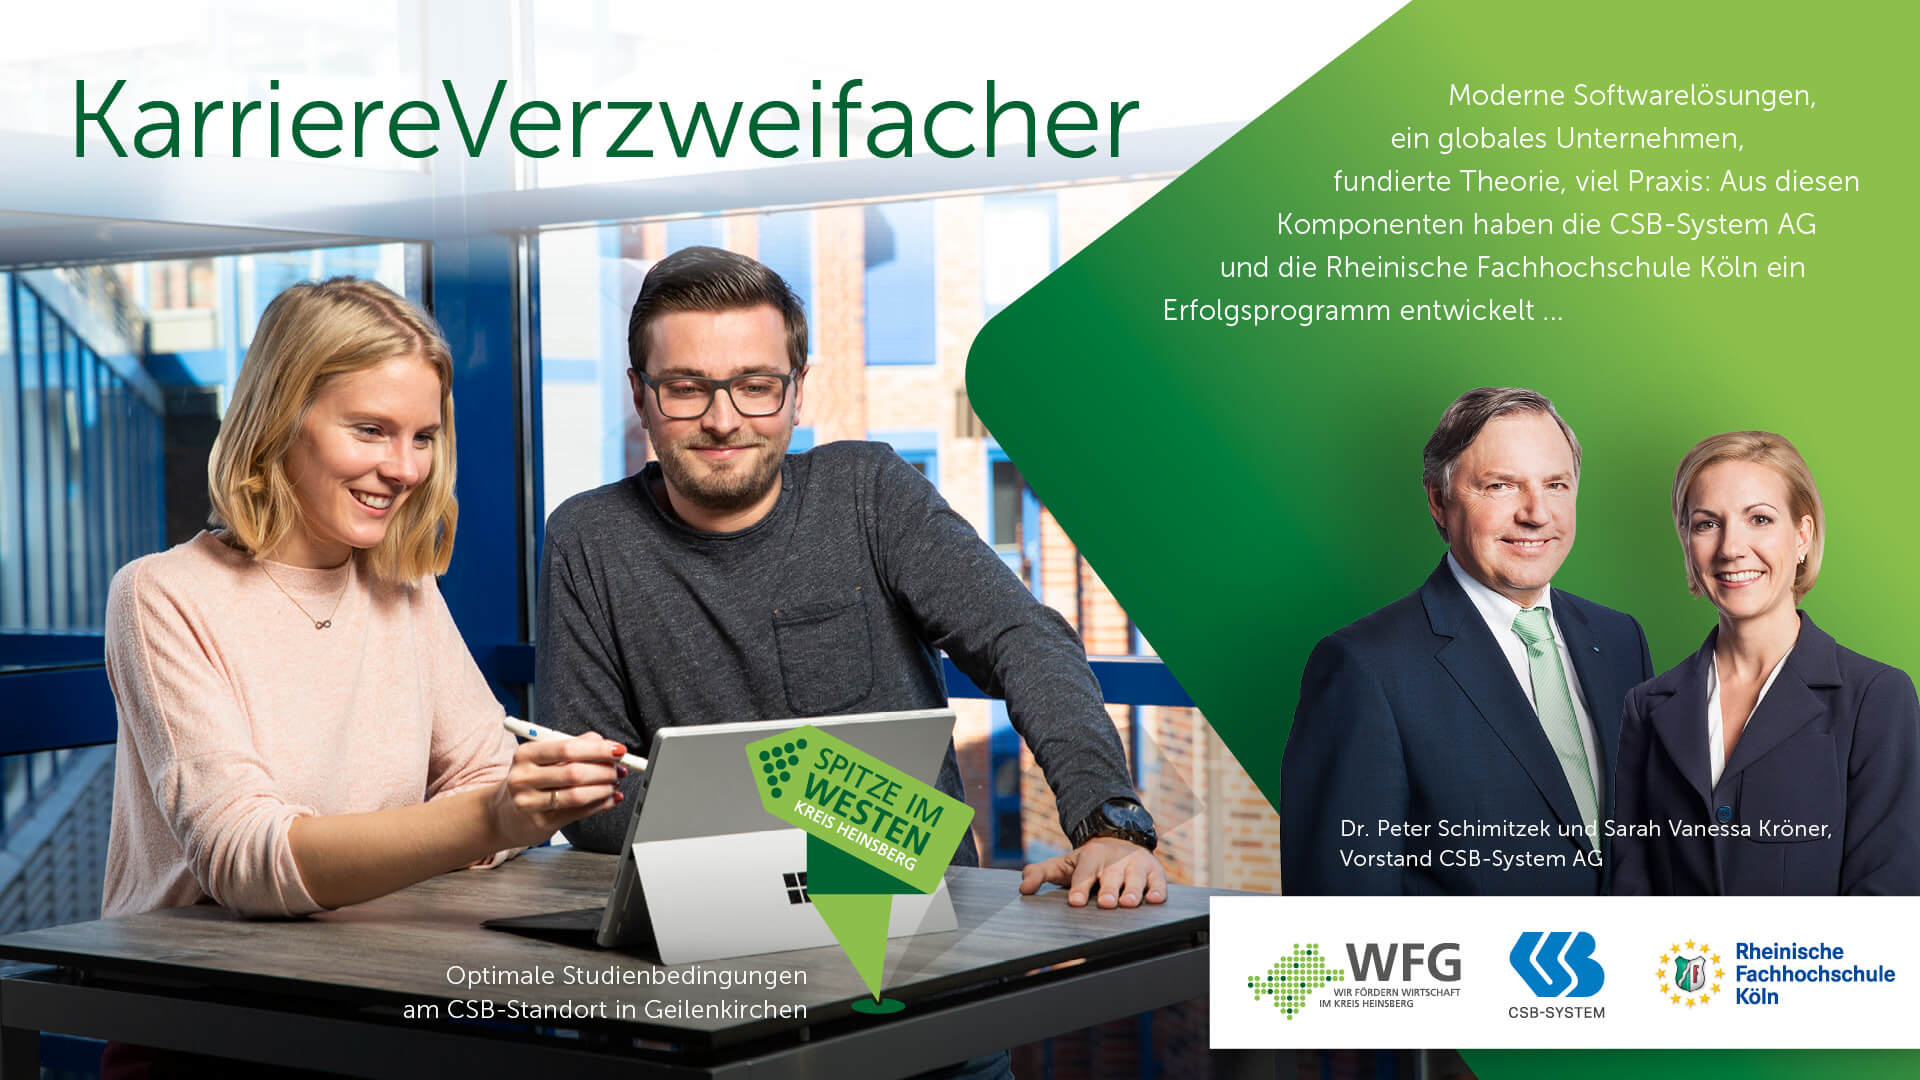 WFG11713_SiW4_CSB_Web_Profilseiten_Header